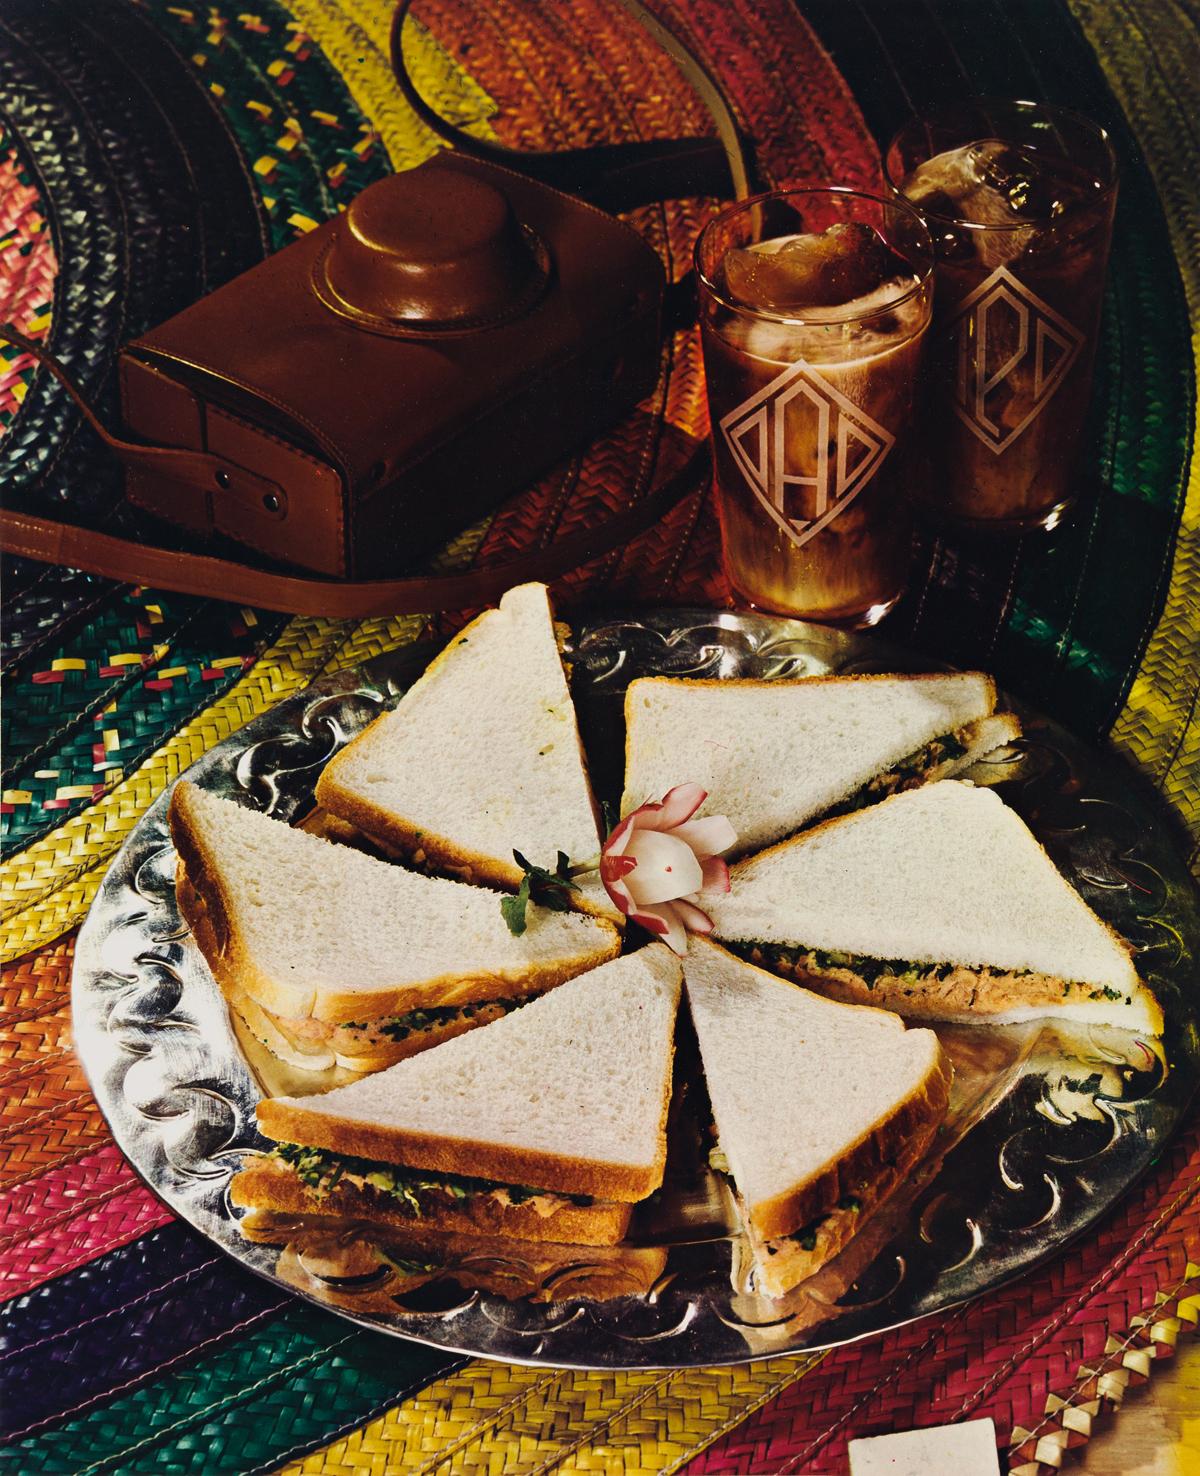 PAUL OUTERBRIDGE JR. (1896-4958) Sandwiches on Tray.